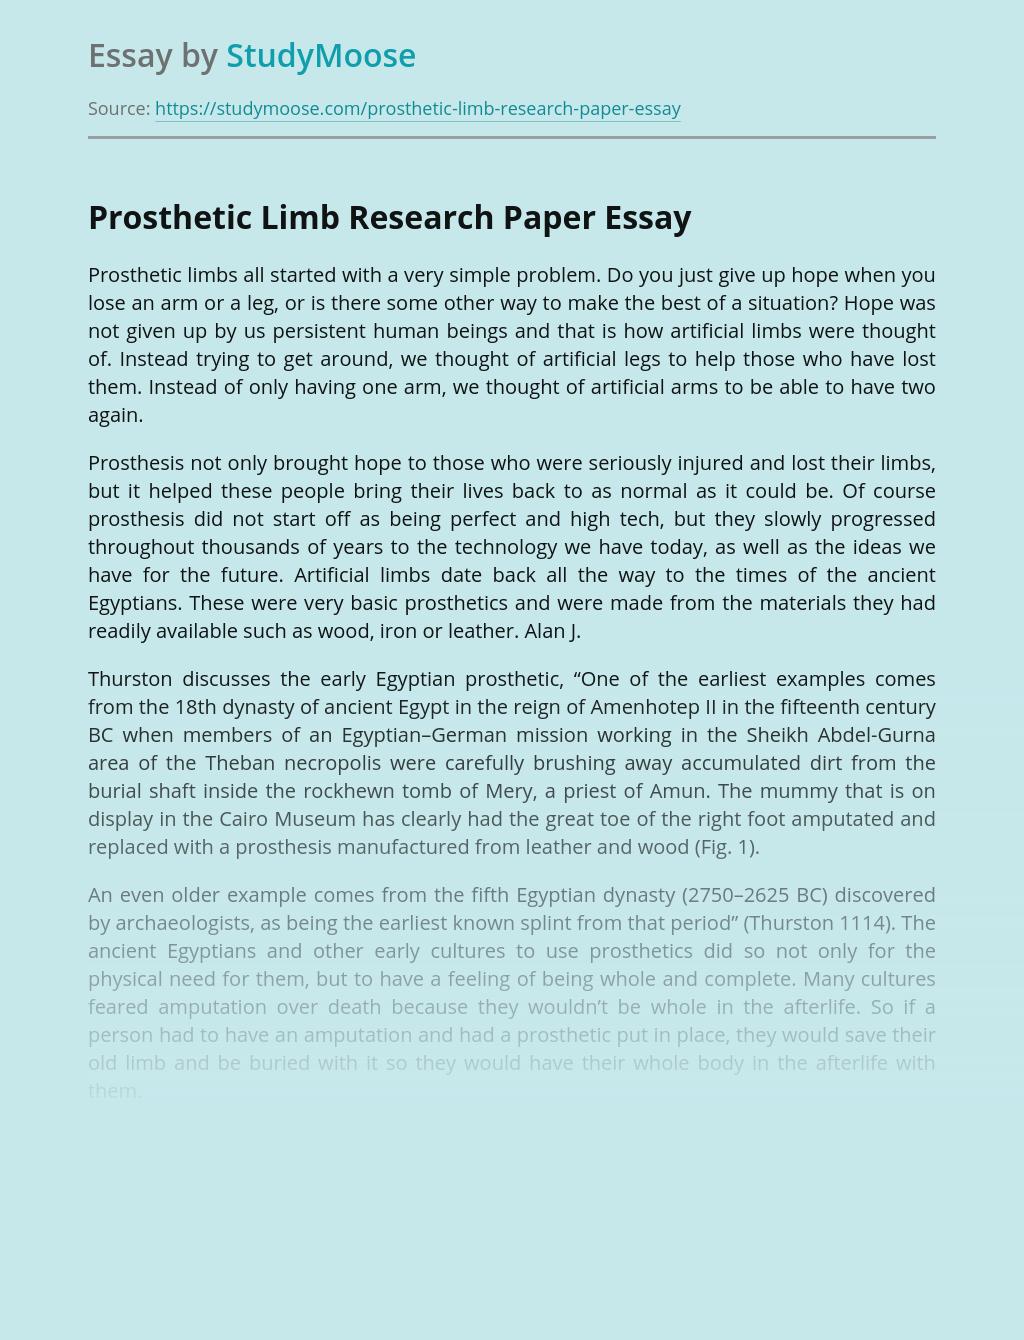 Prosthetic Limb Research Paper